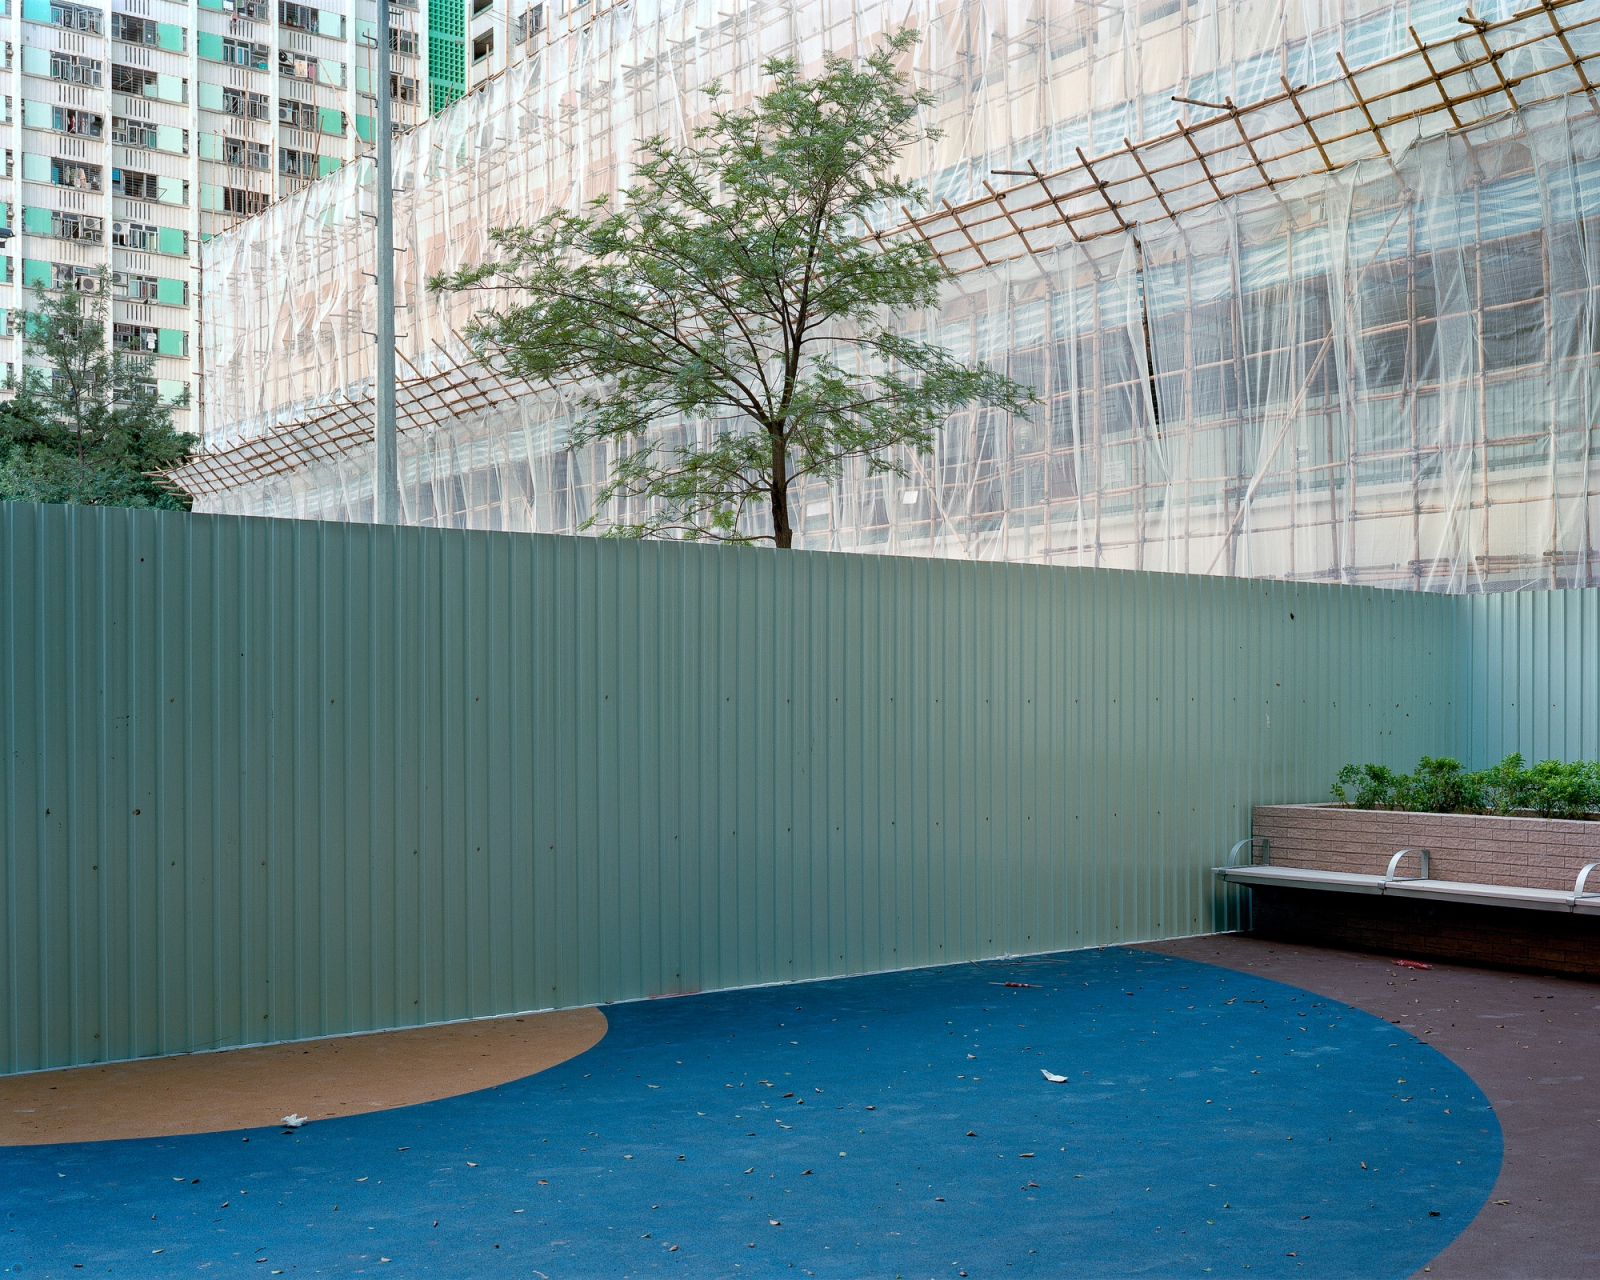 "Folded restaurant #3, Ping Shek Estate, 8/2012 Archival Pigment Inkjet Print 28.8"" x 36"" / 40"" x 50"""